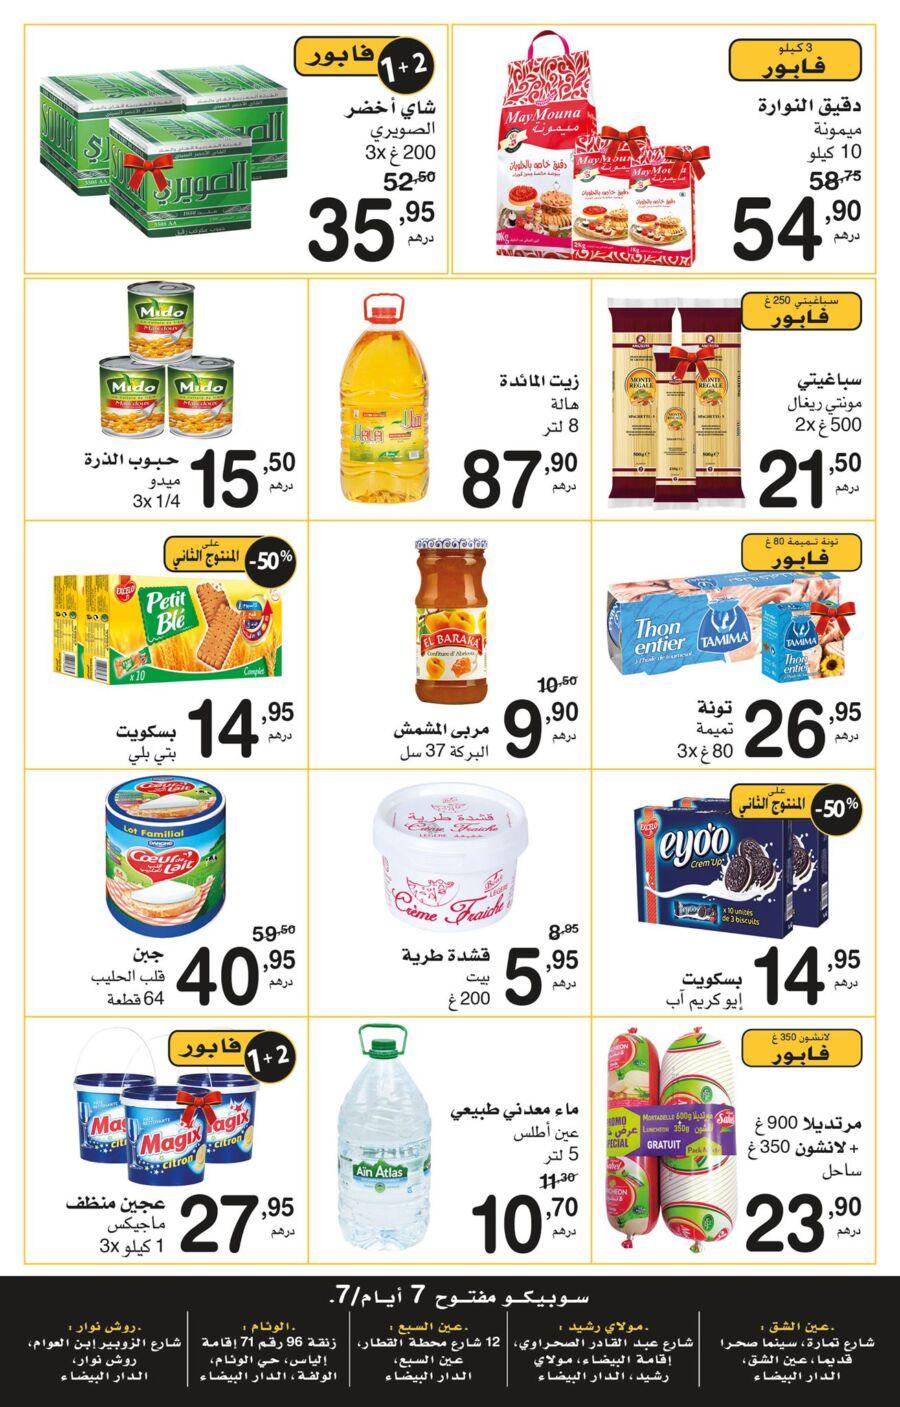 Catalogue Supeco Maroc أثمنة ديما رخيصة du 9 Novembre au 9 Décembre 2020